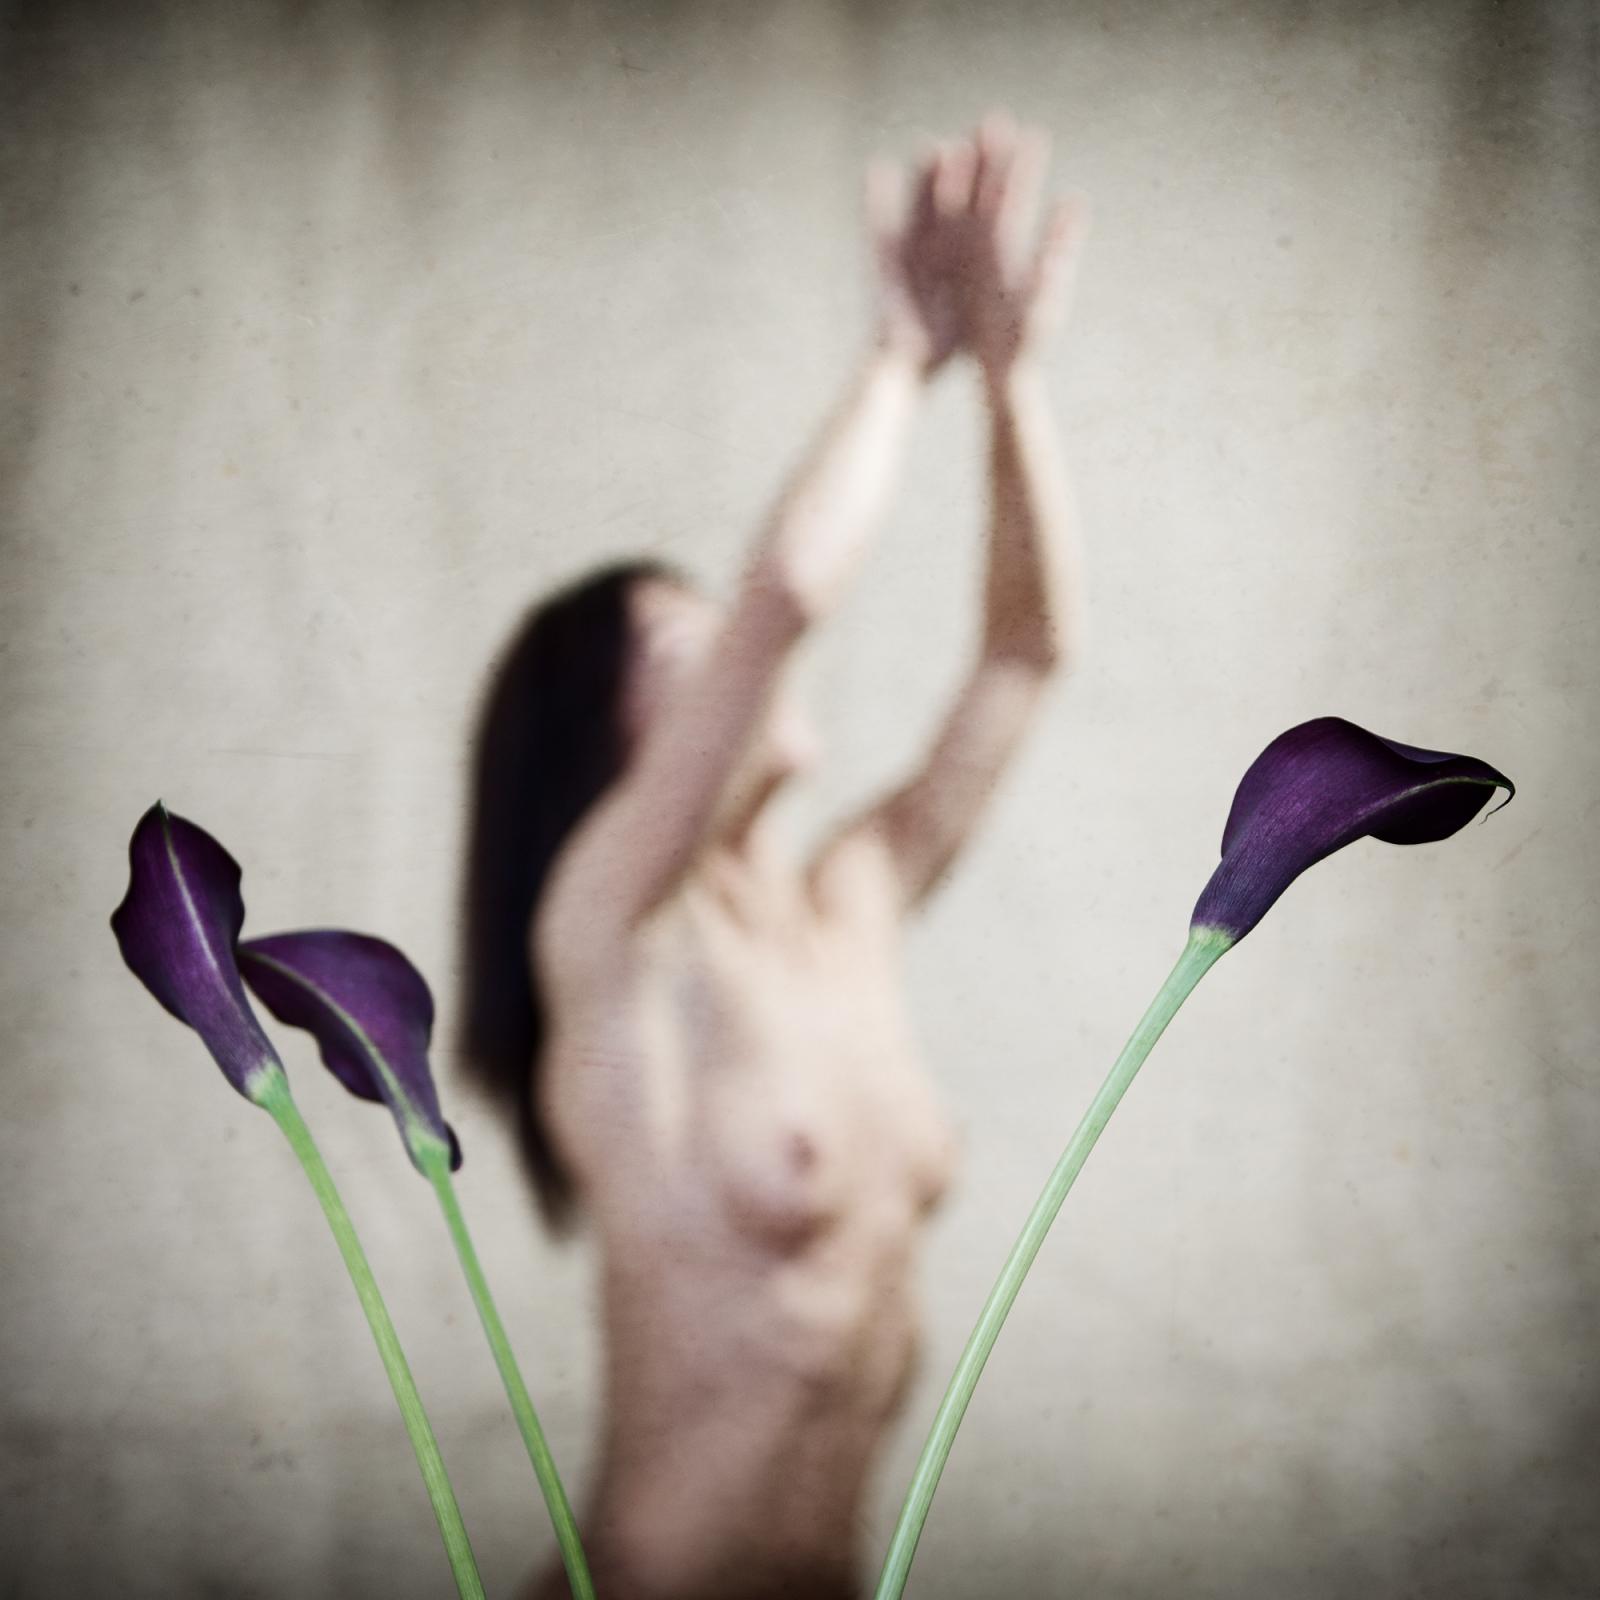 Fine art portrait of female reaching upwards behind a vase of cala lilies